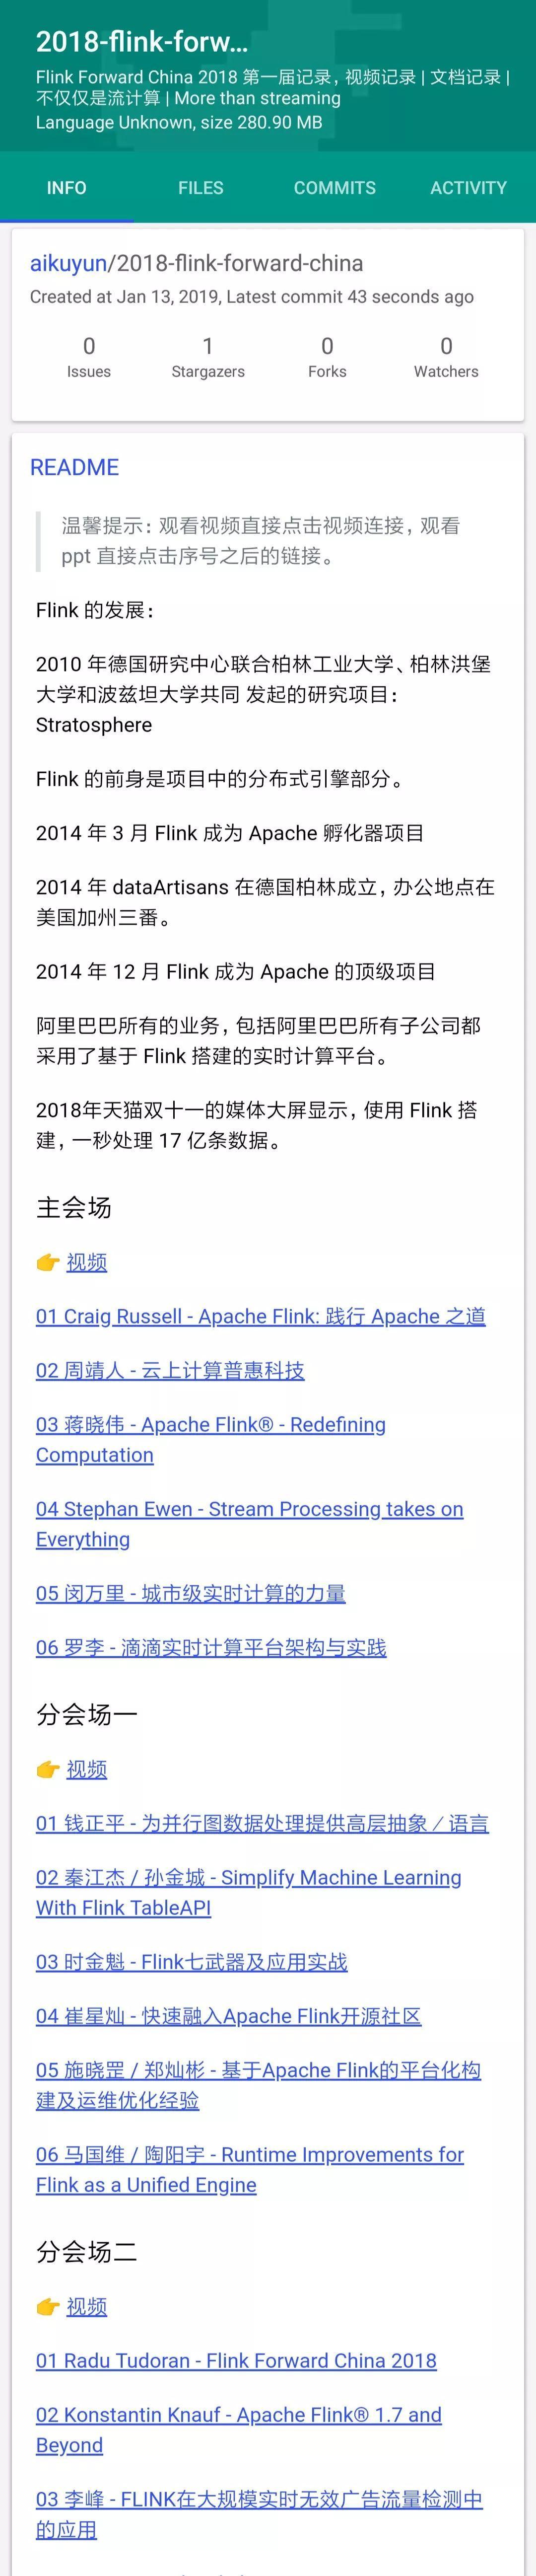 Flink 纯干货一次性都给你| Flink Forward China 2018 大会所有ppt